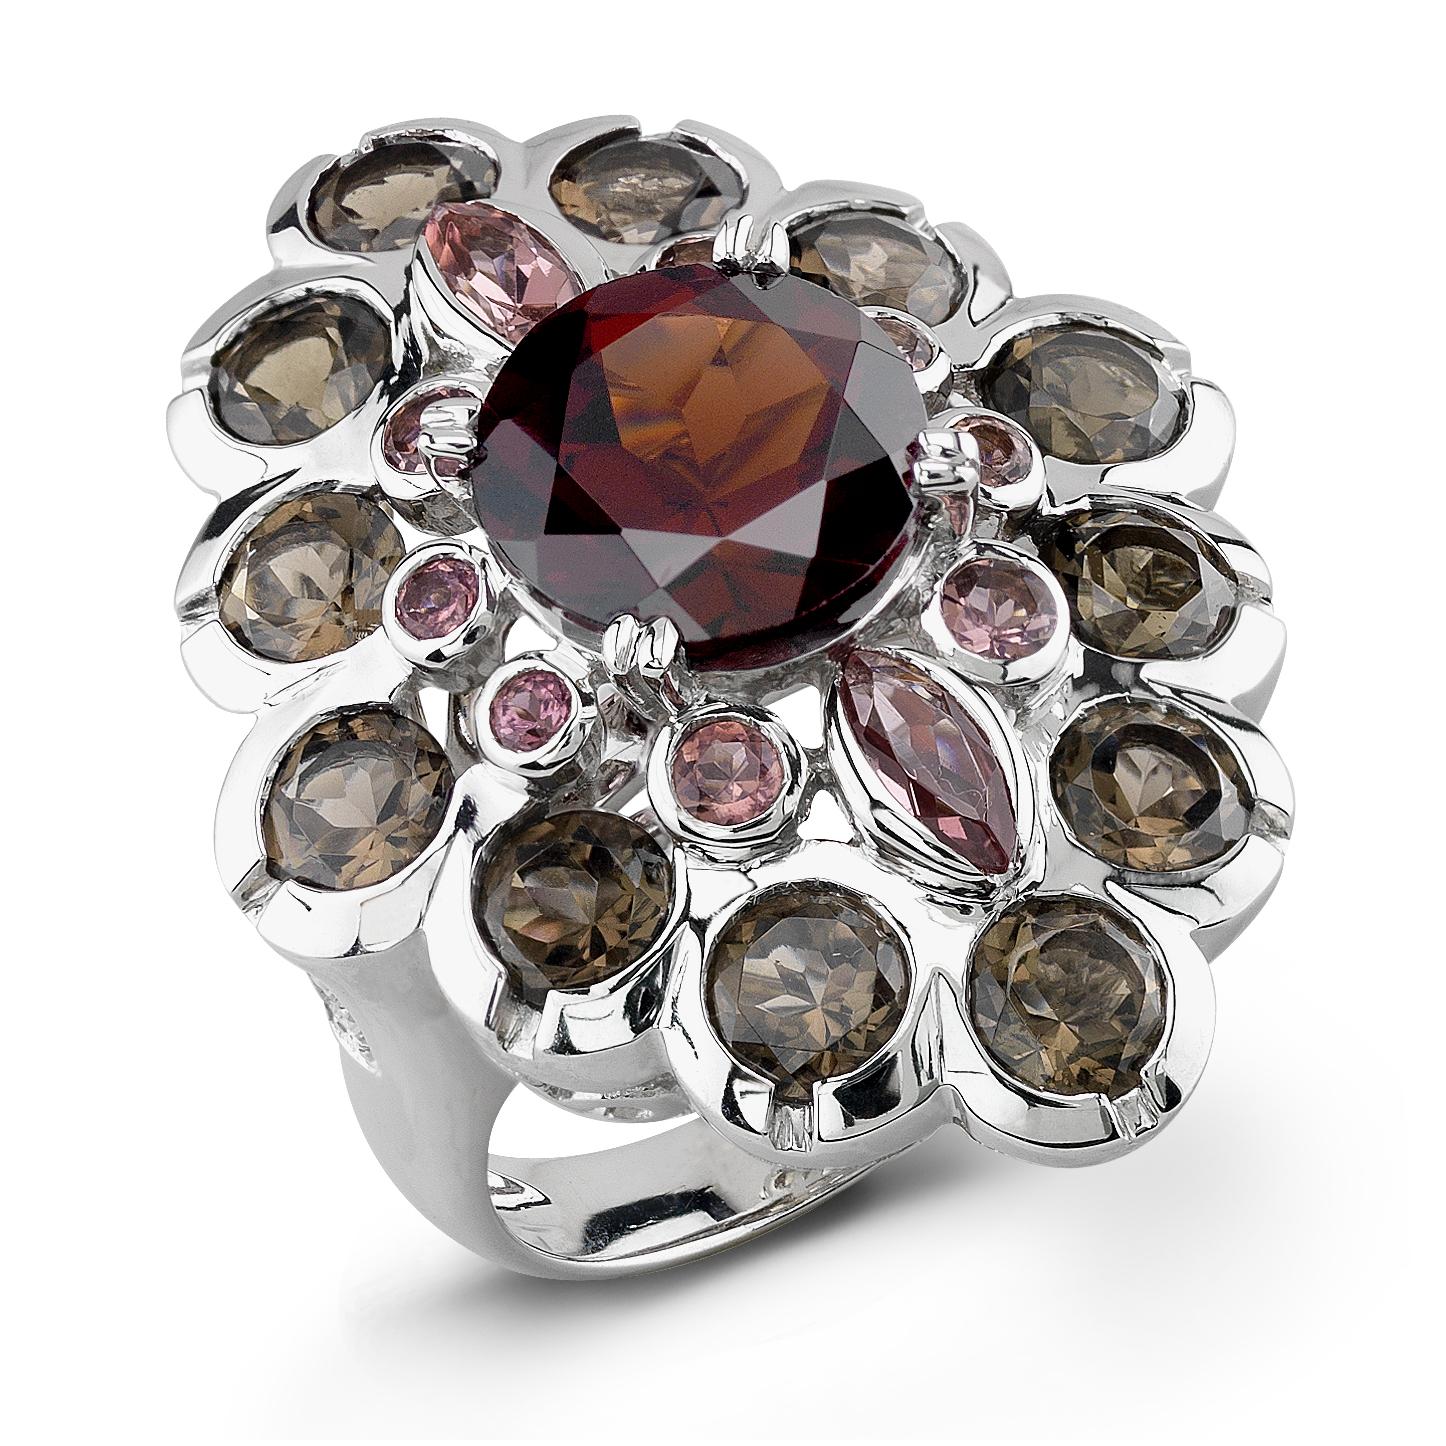 Badgley Mischka Multi Color Stone Ring by Zale